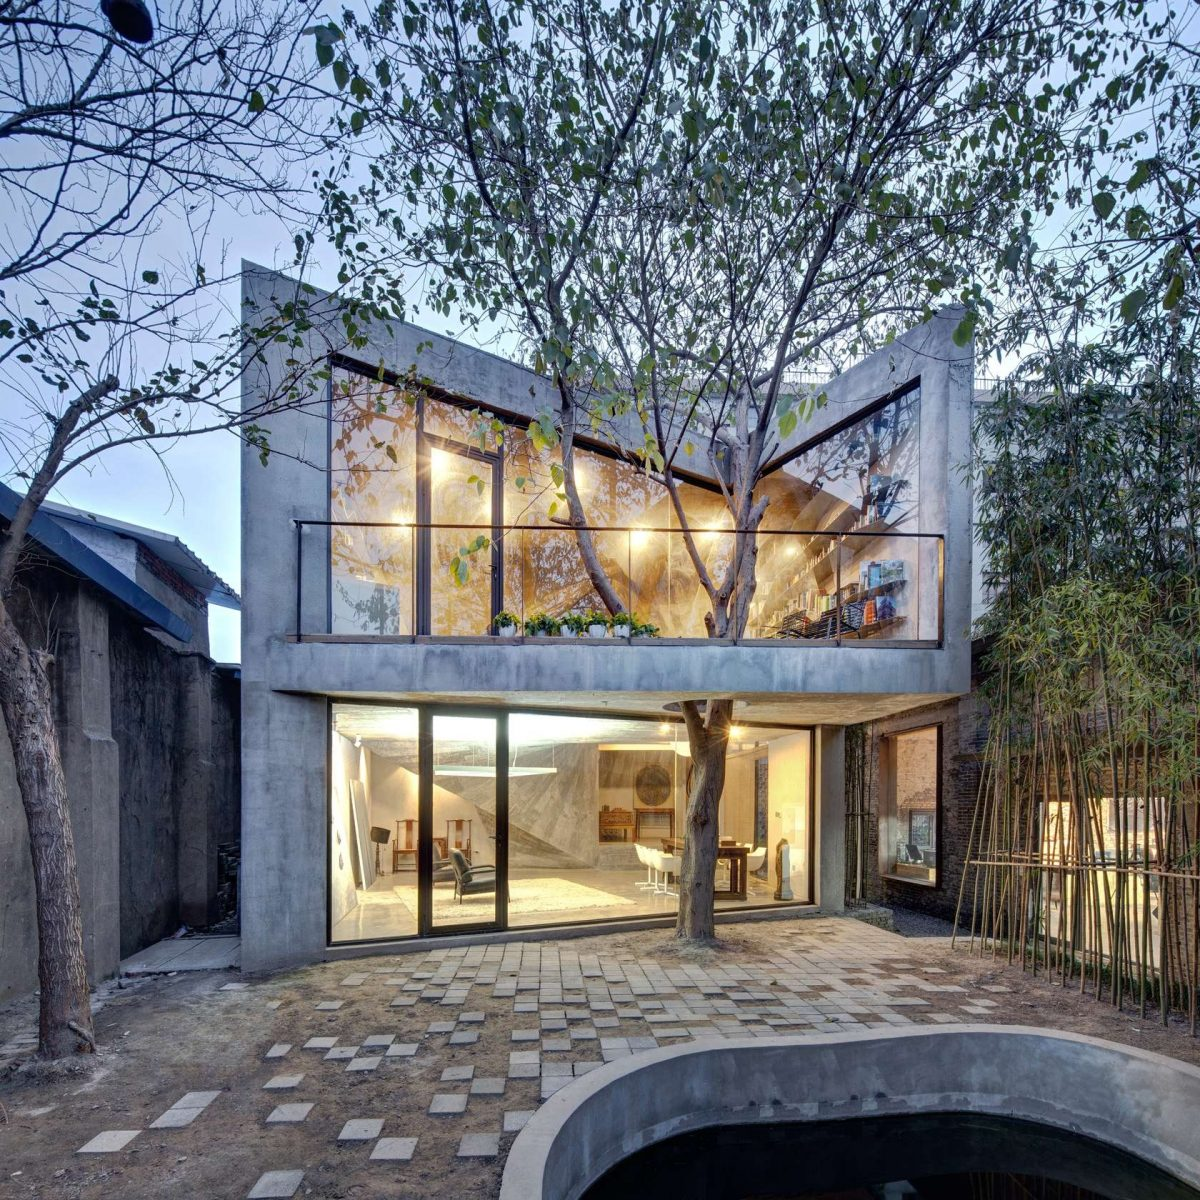 casa-cemento-ampie-vetrate